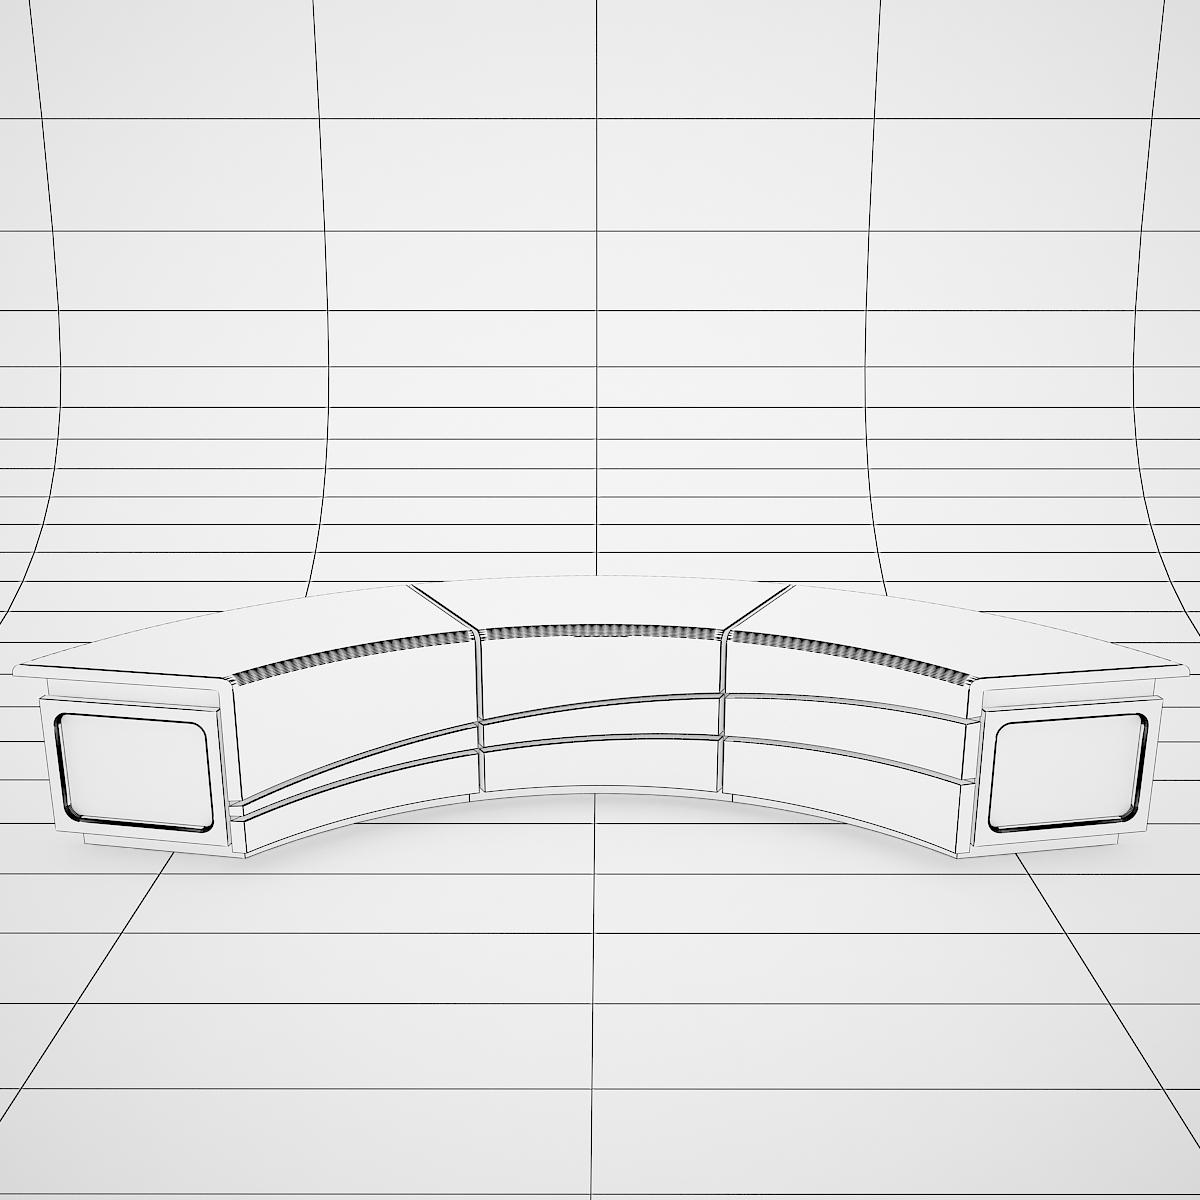 virtual tv studio news desk 4 3d model 3ds max dxf fbx  obj 215944